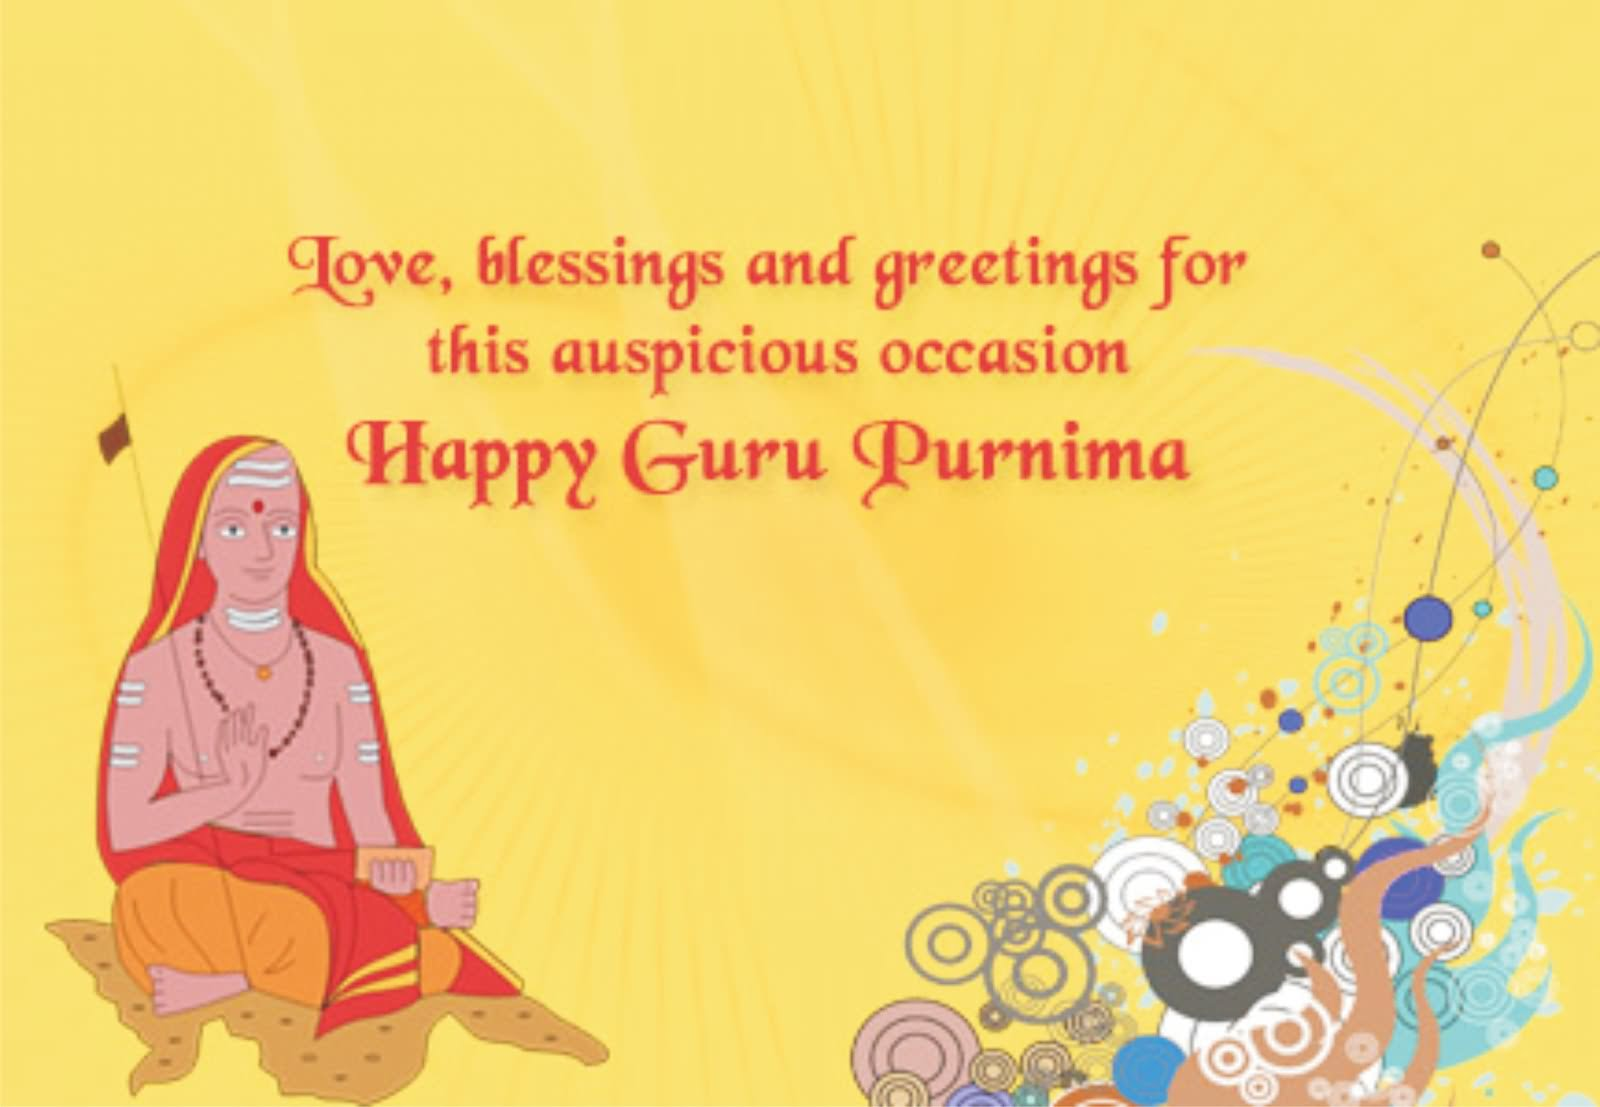 Guru Purnima Cards Images Archives Car Insurance Quotes